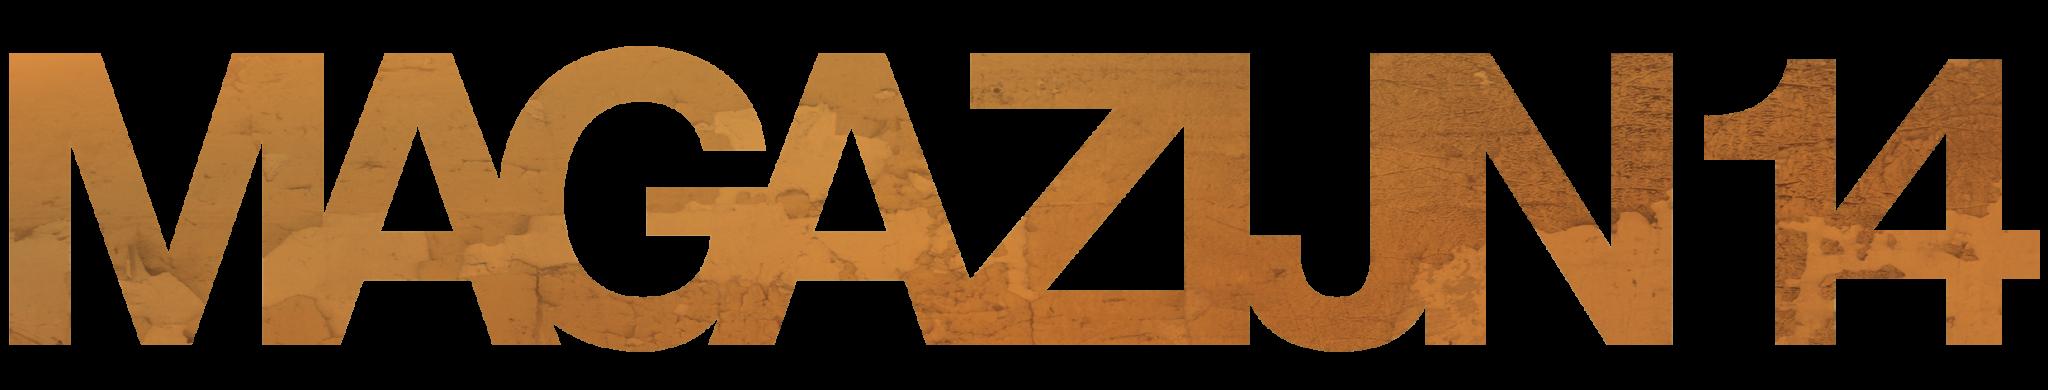 Magazijn 14 - logo